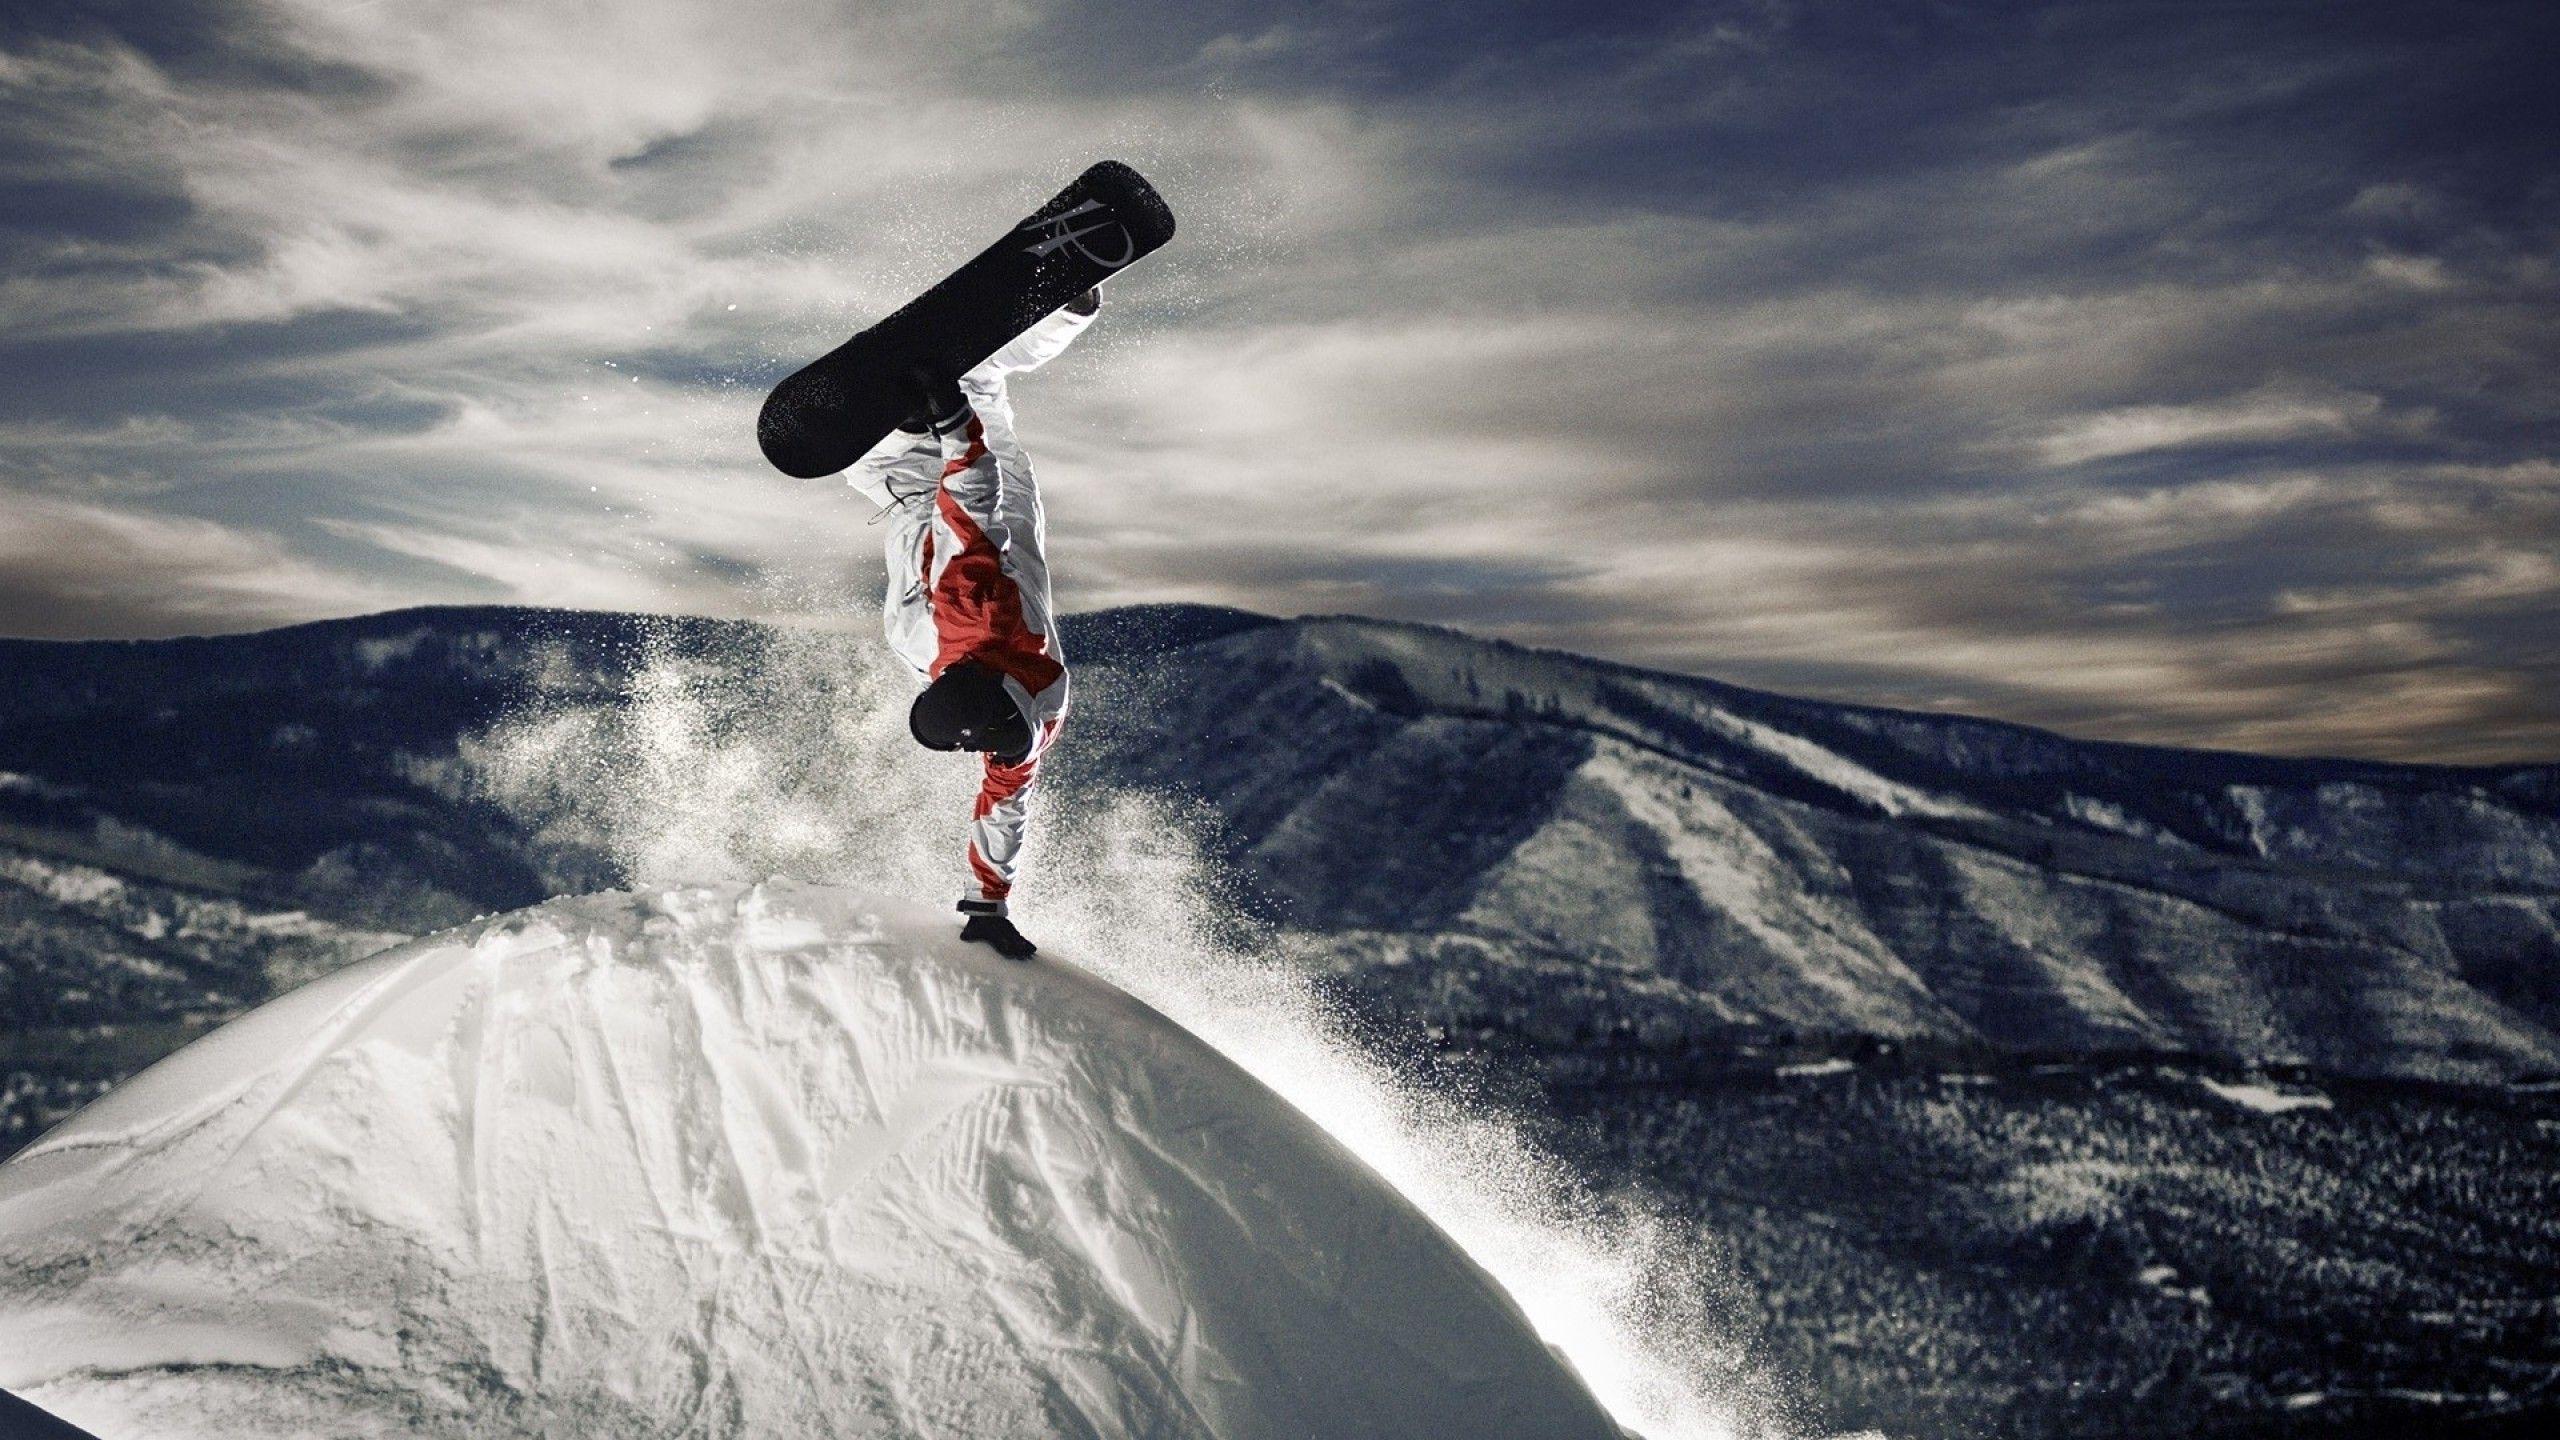 Snowboarding Wallpapers HD - Wallpaper - 543.2KB